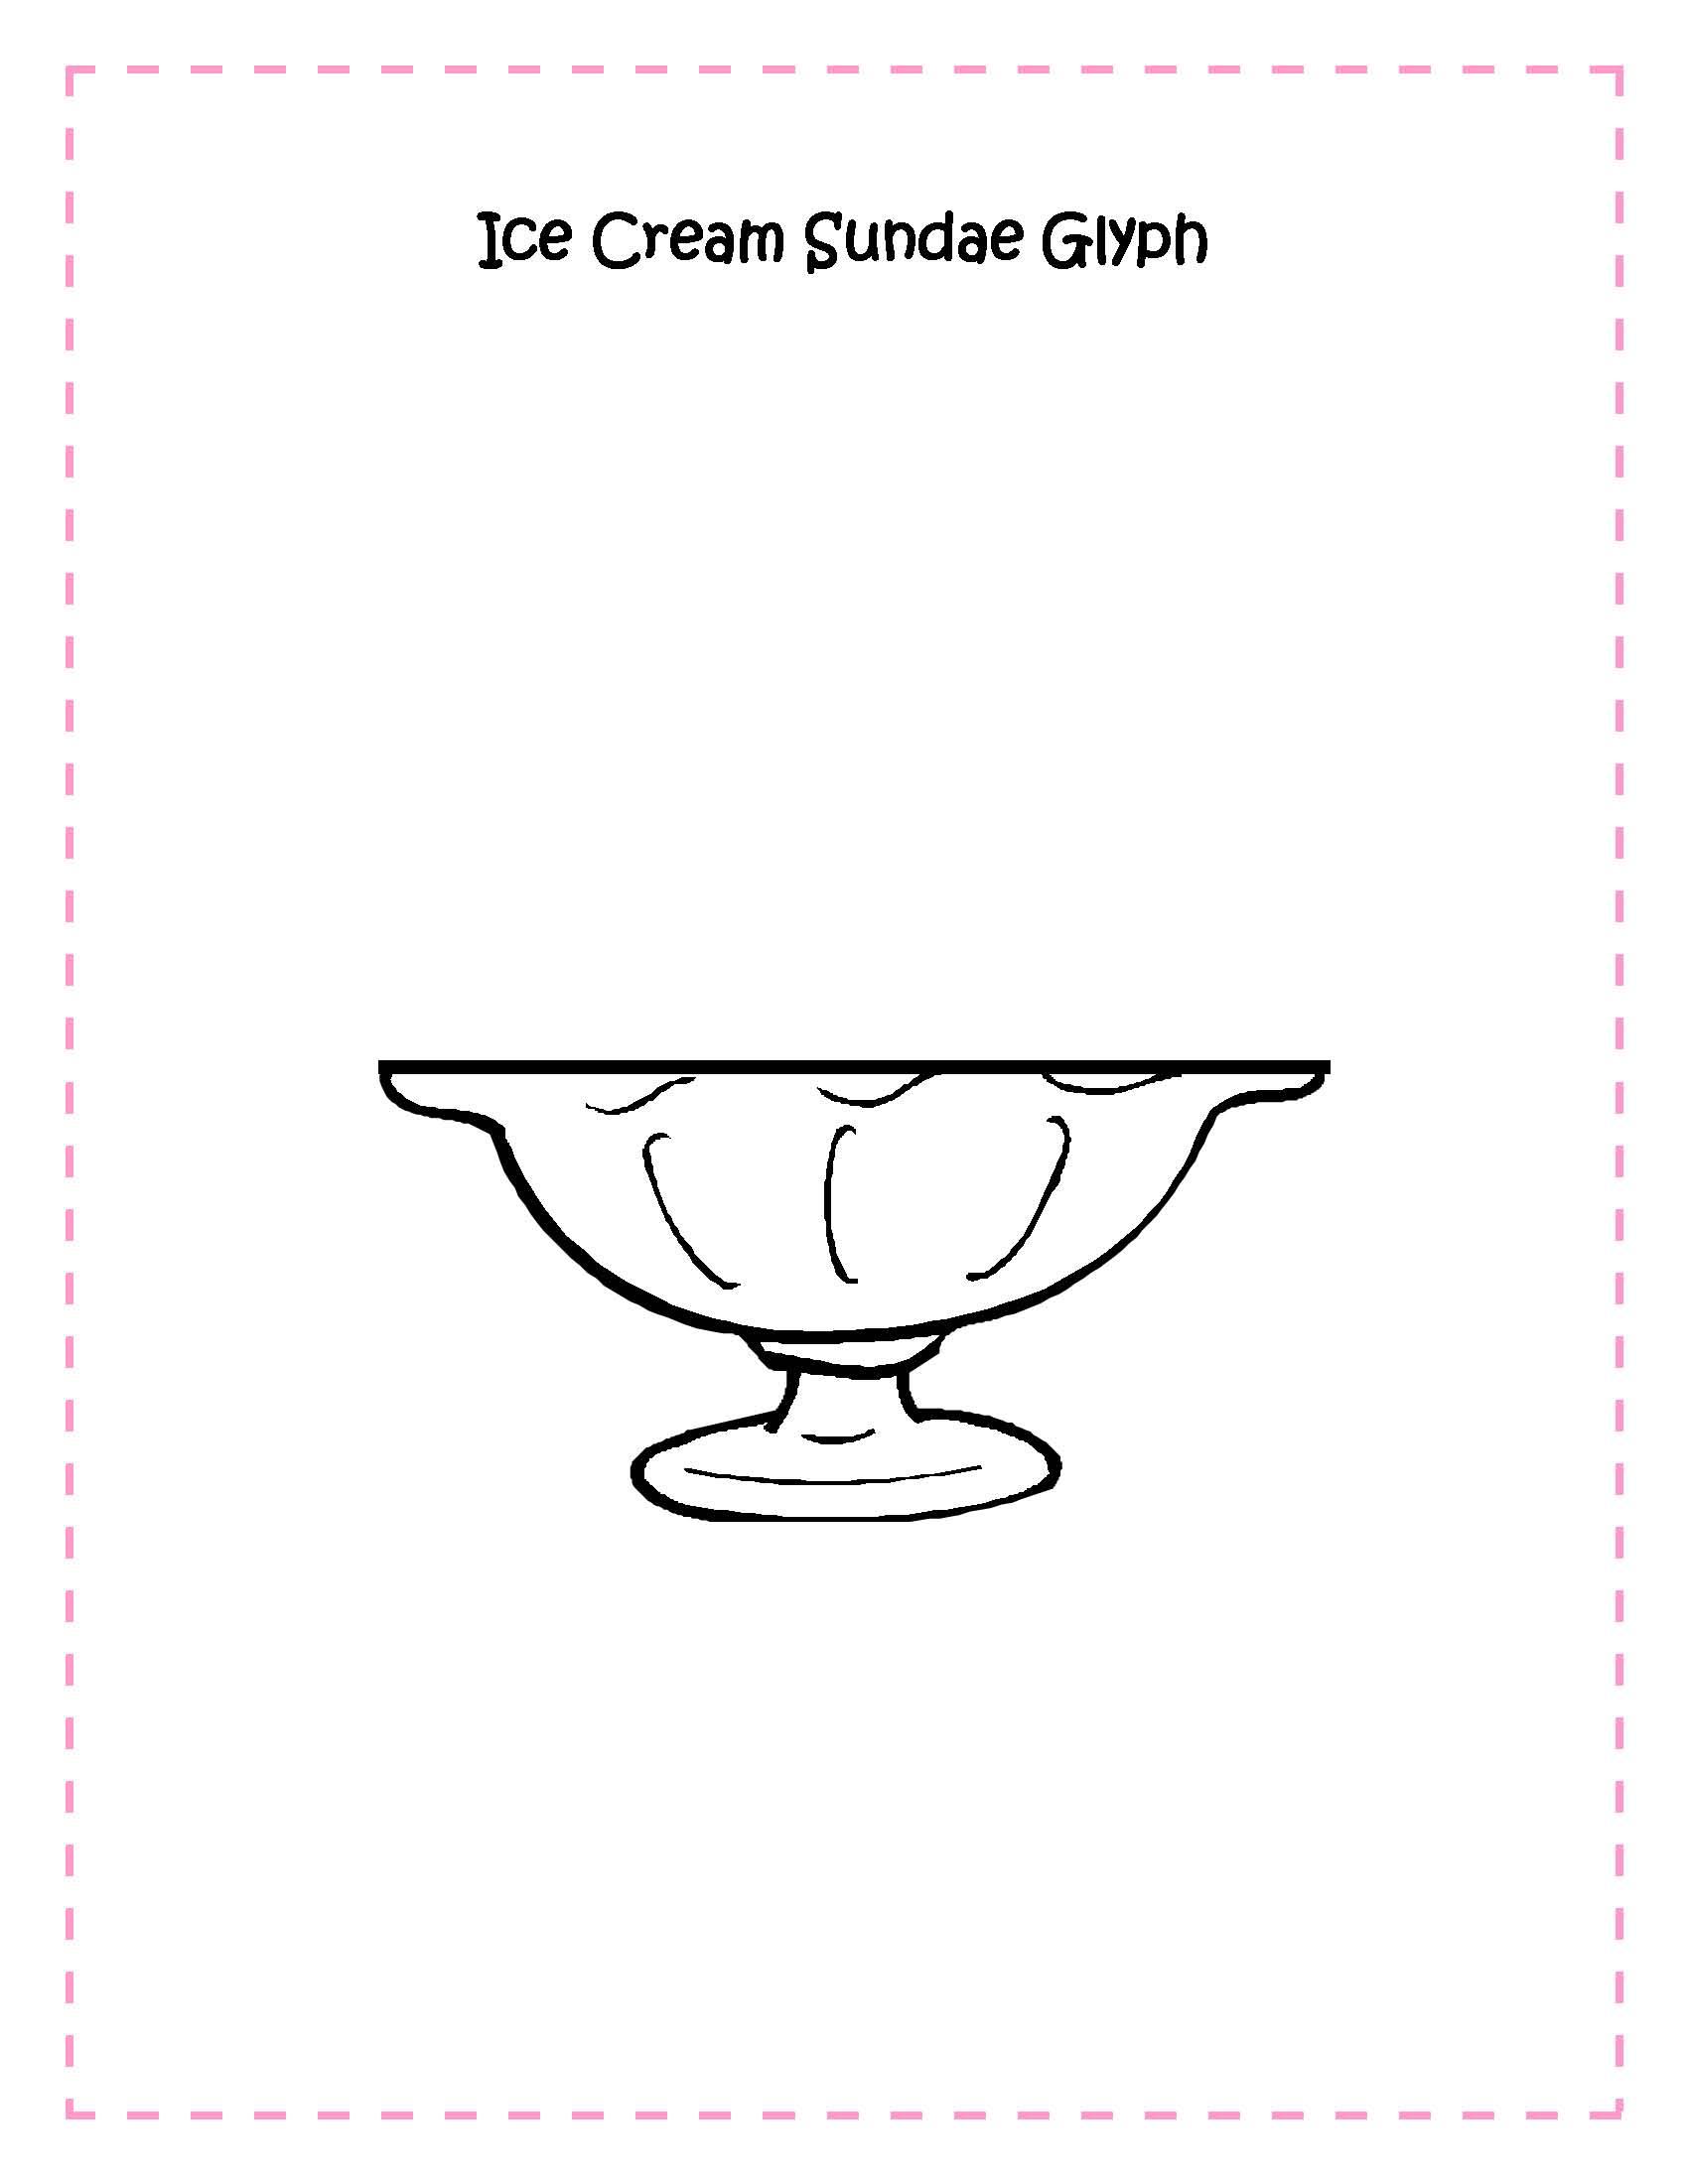 5 Best Images of Ice Cream Sundae Patterns Printable - Ice ...